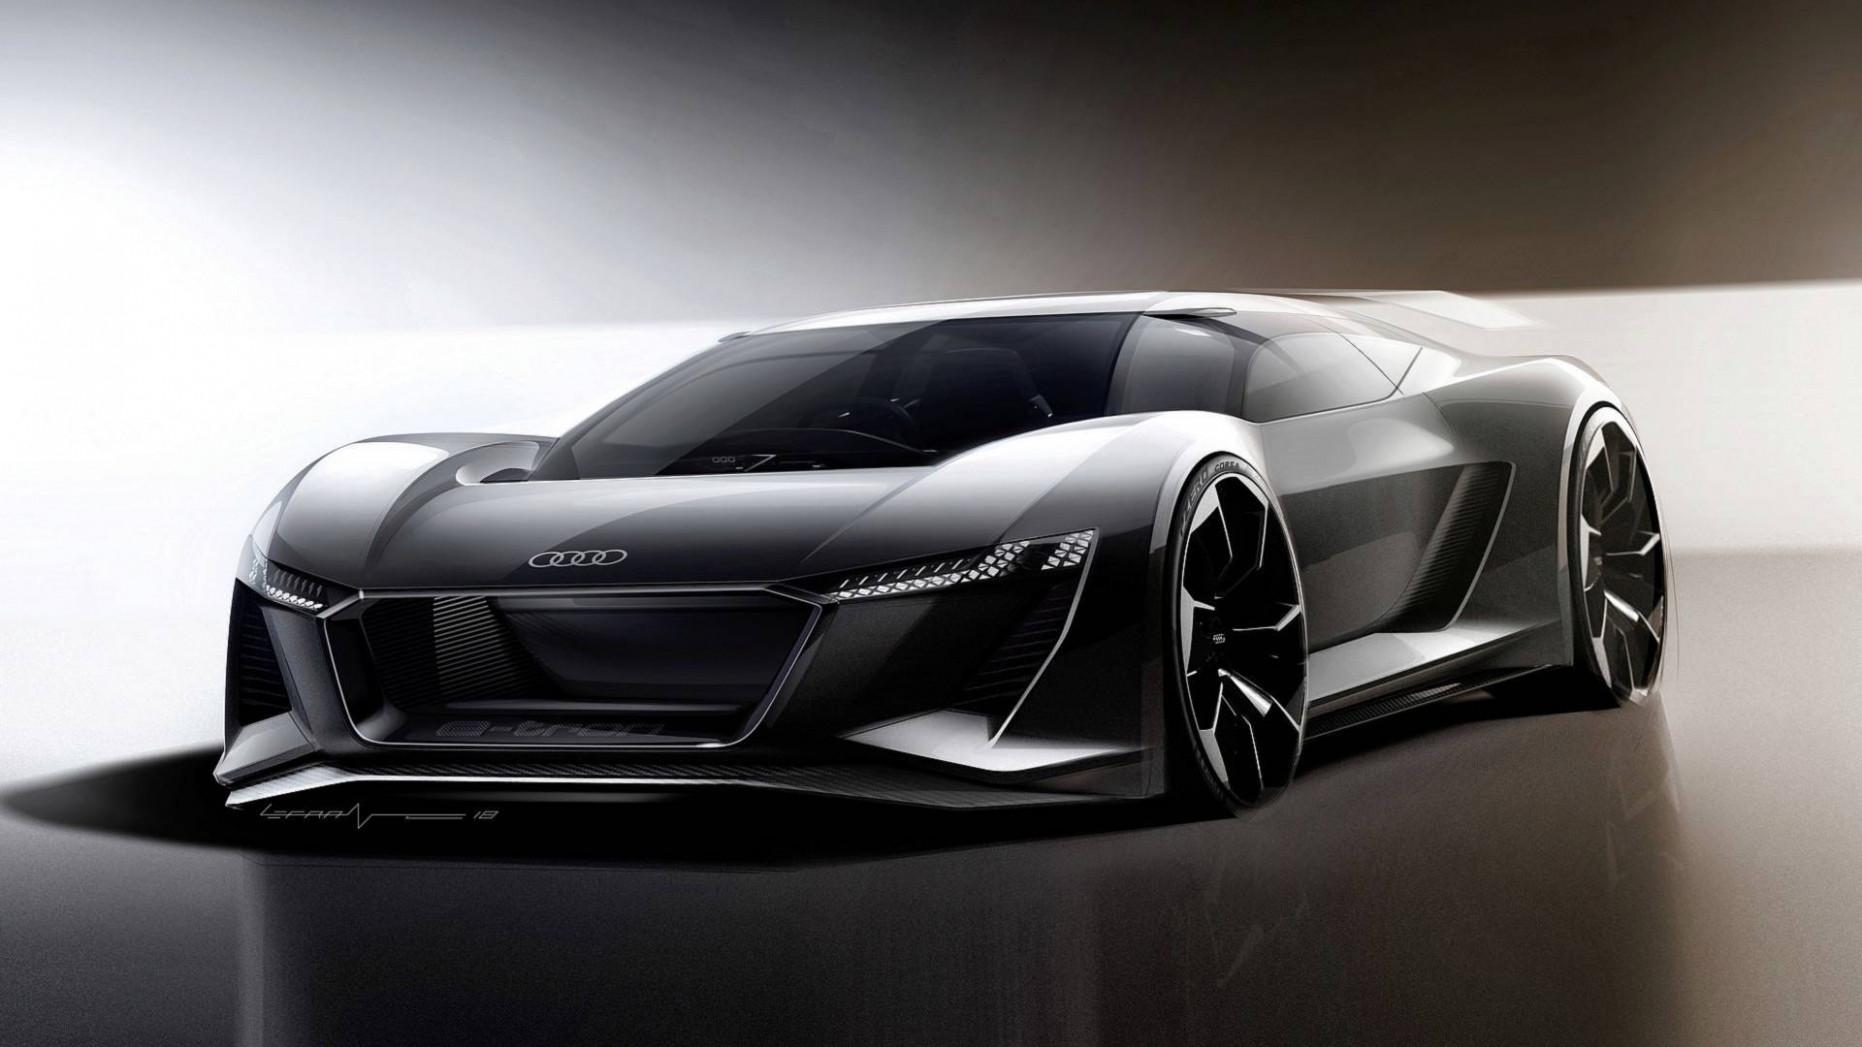 Wallpaper Audi In 2022